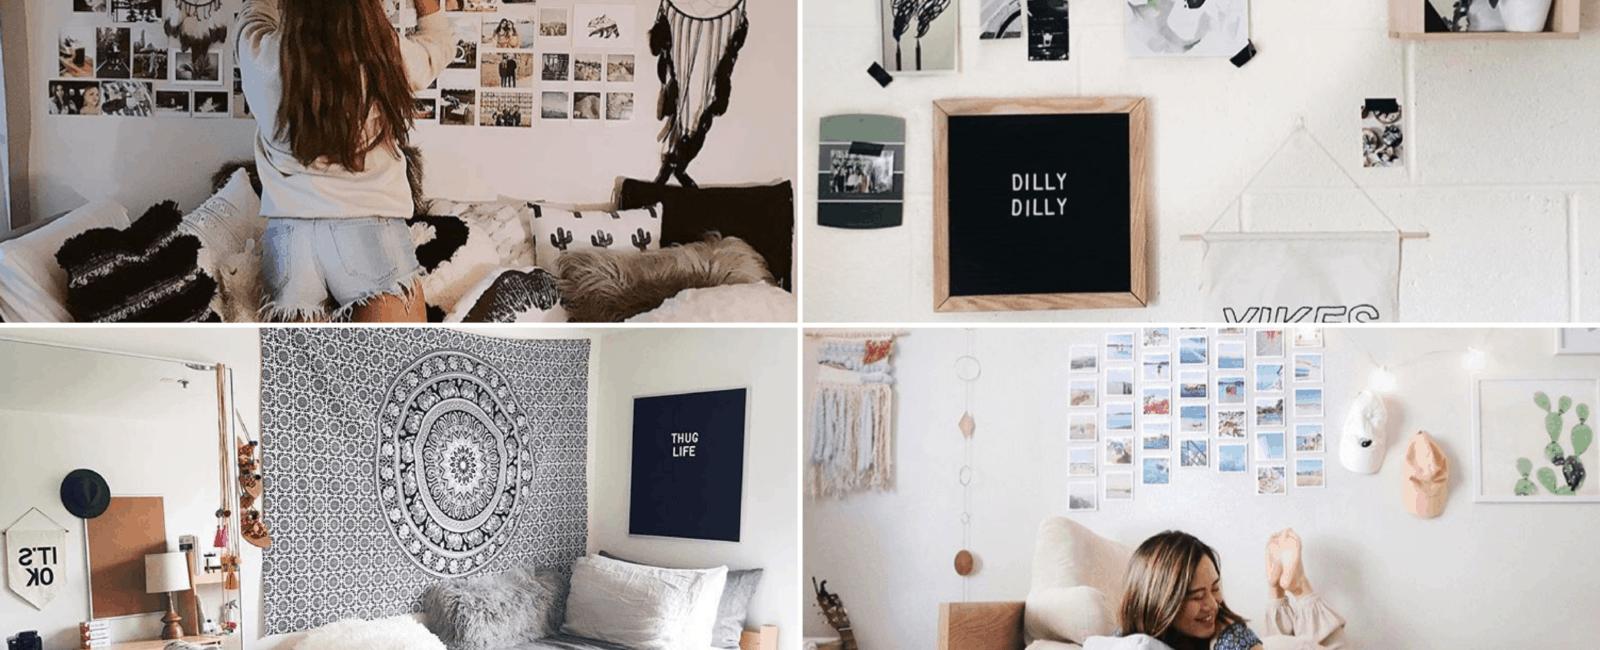 Dorm Room Wall Decor | 9 Genius Ways To Decorate Your Dorm Room Walls